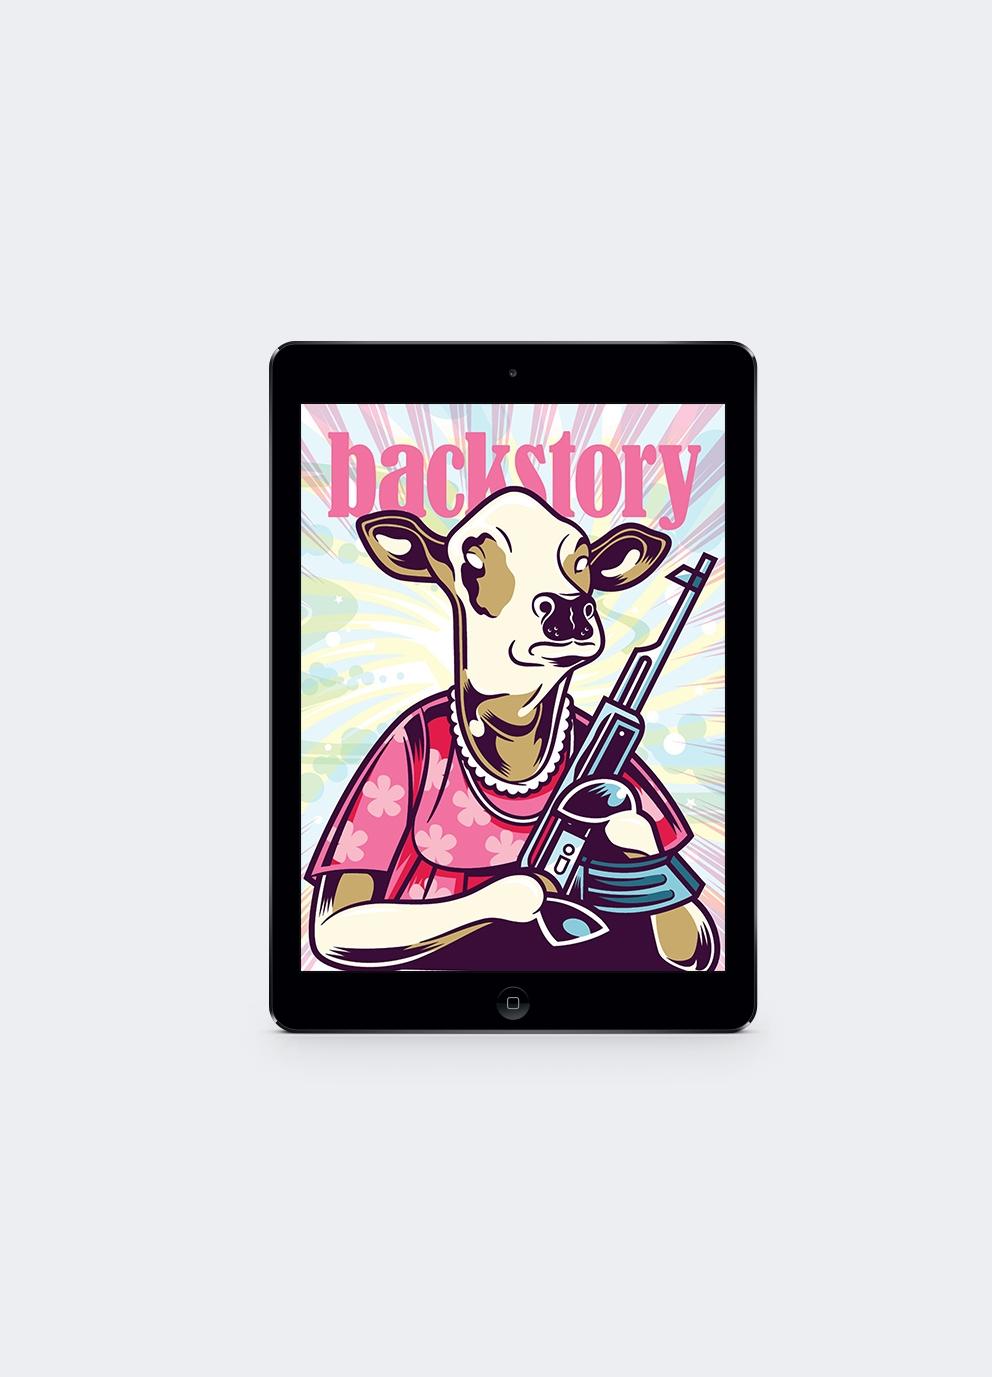 BackStory Ipad Magazine